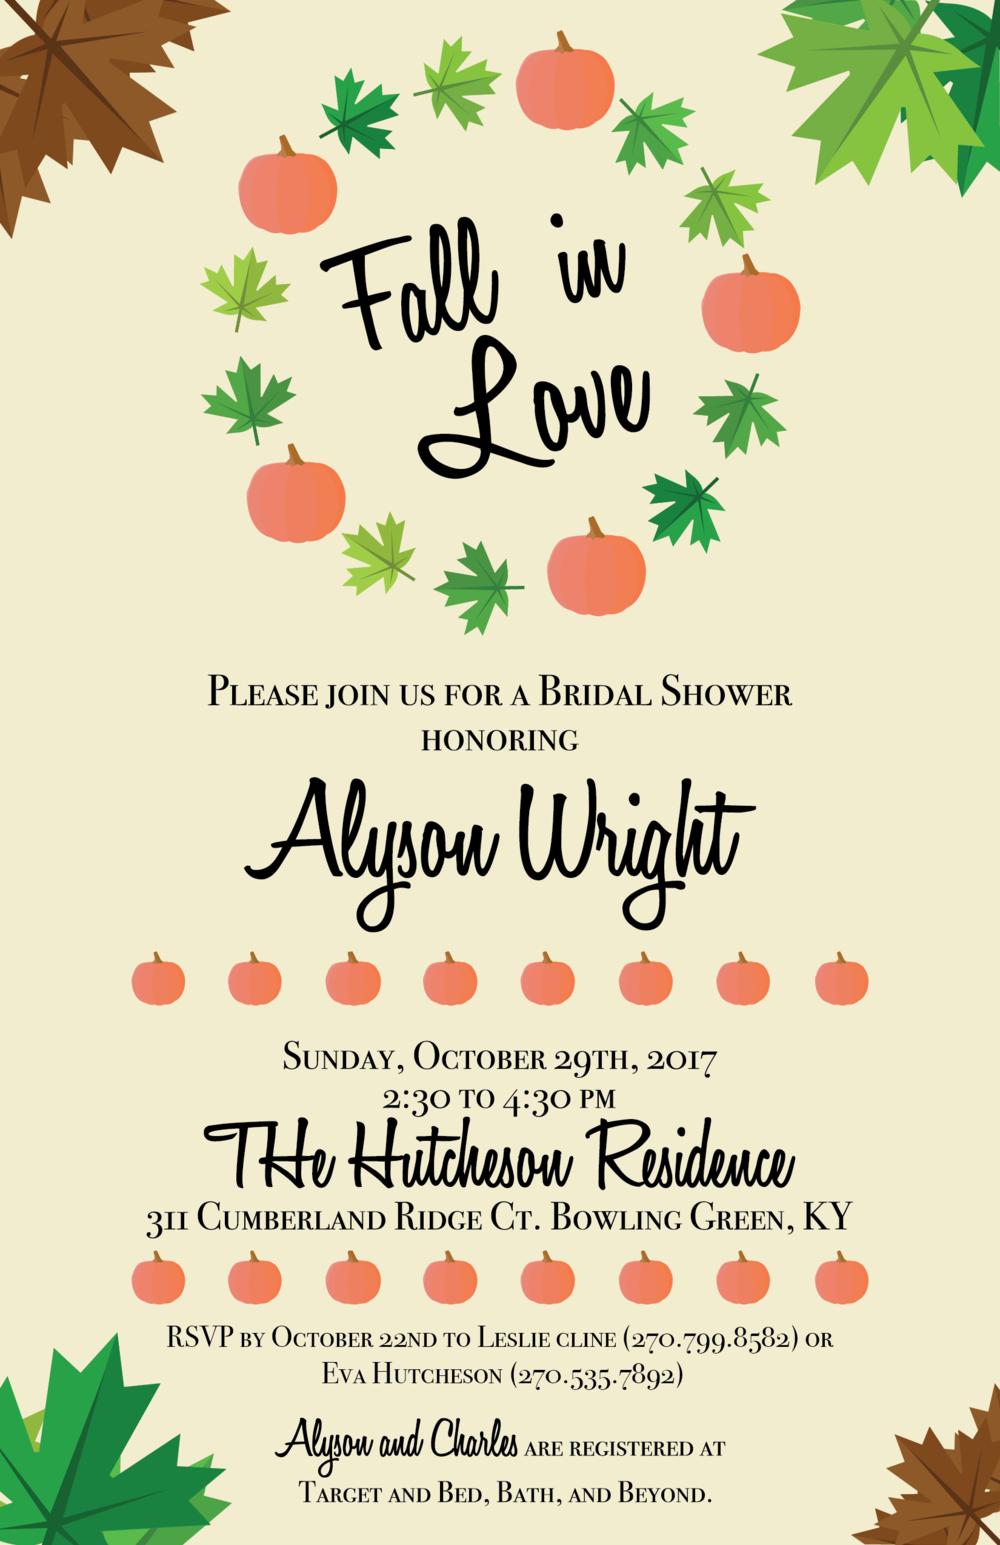 AllyWrightWeddingInvite-01.png